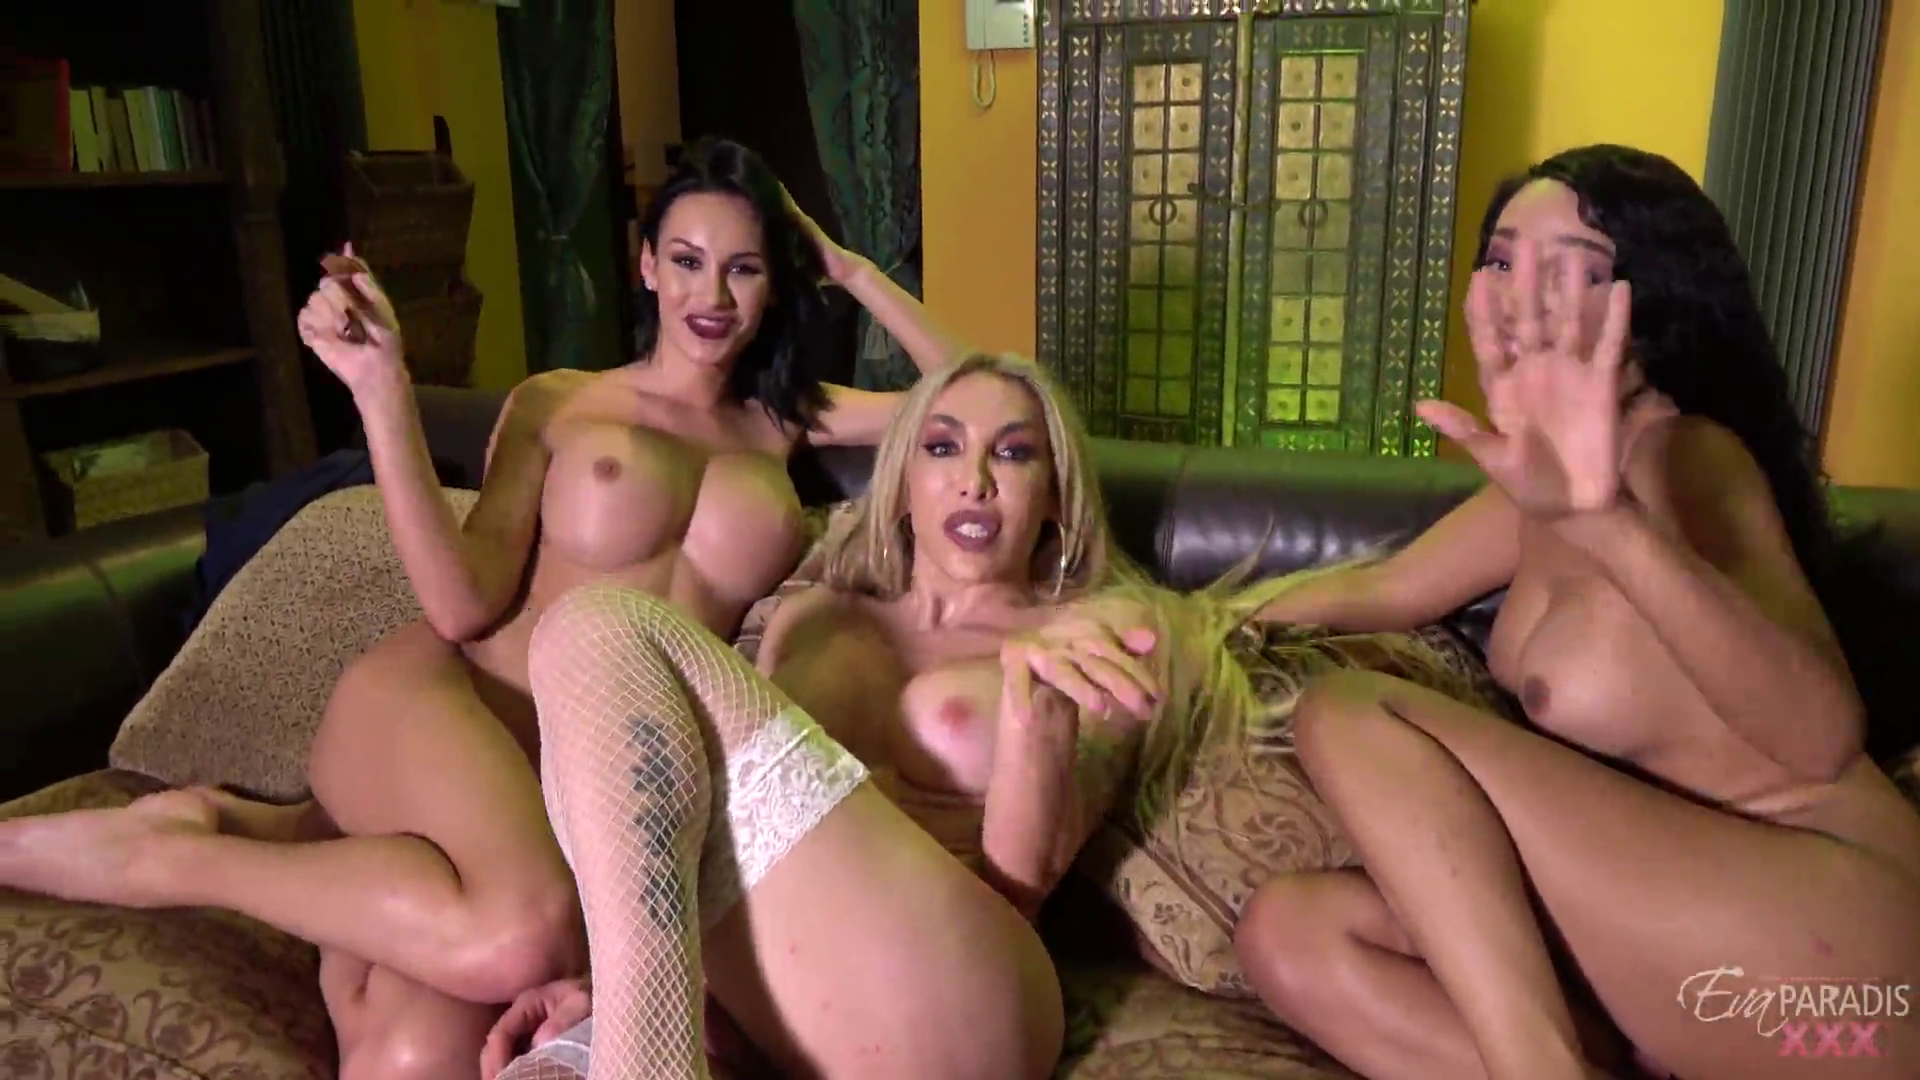 Eva Paradis, Sunshyne Monroe y Kimberlee en una Rica Orgia